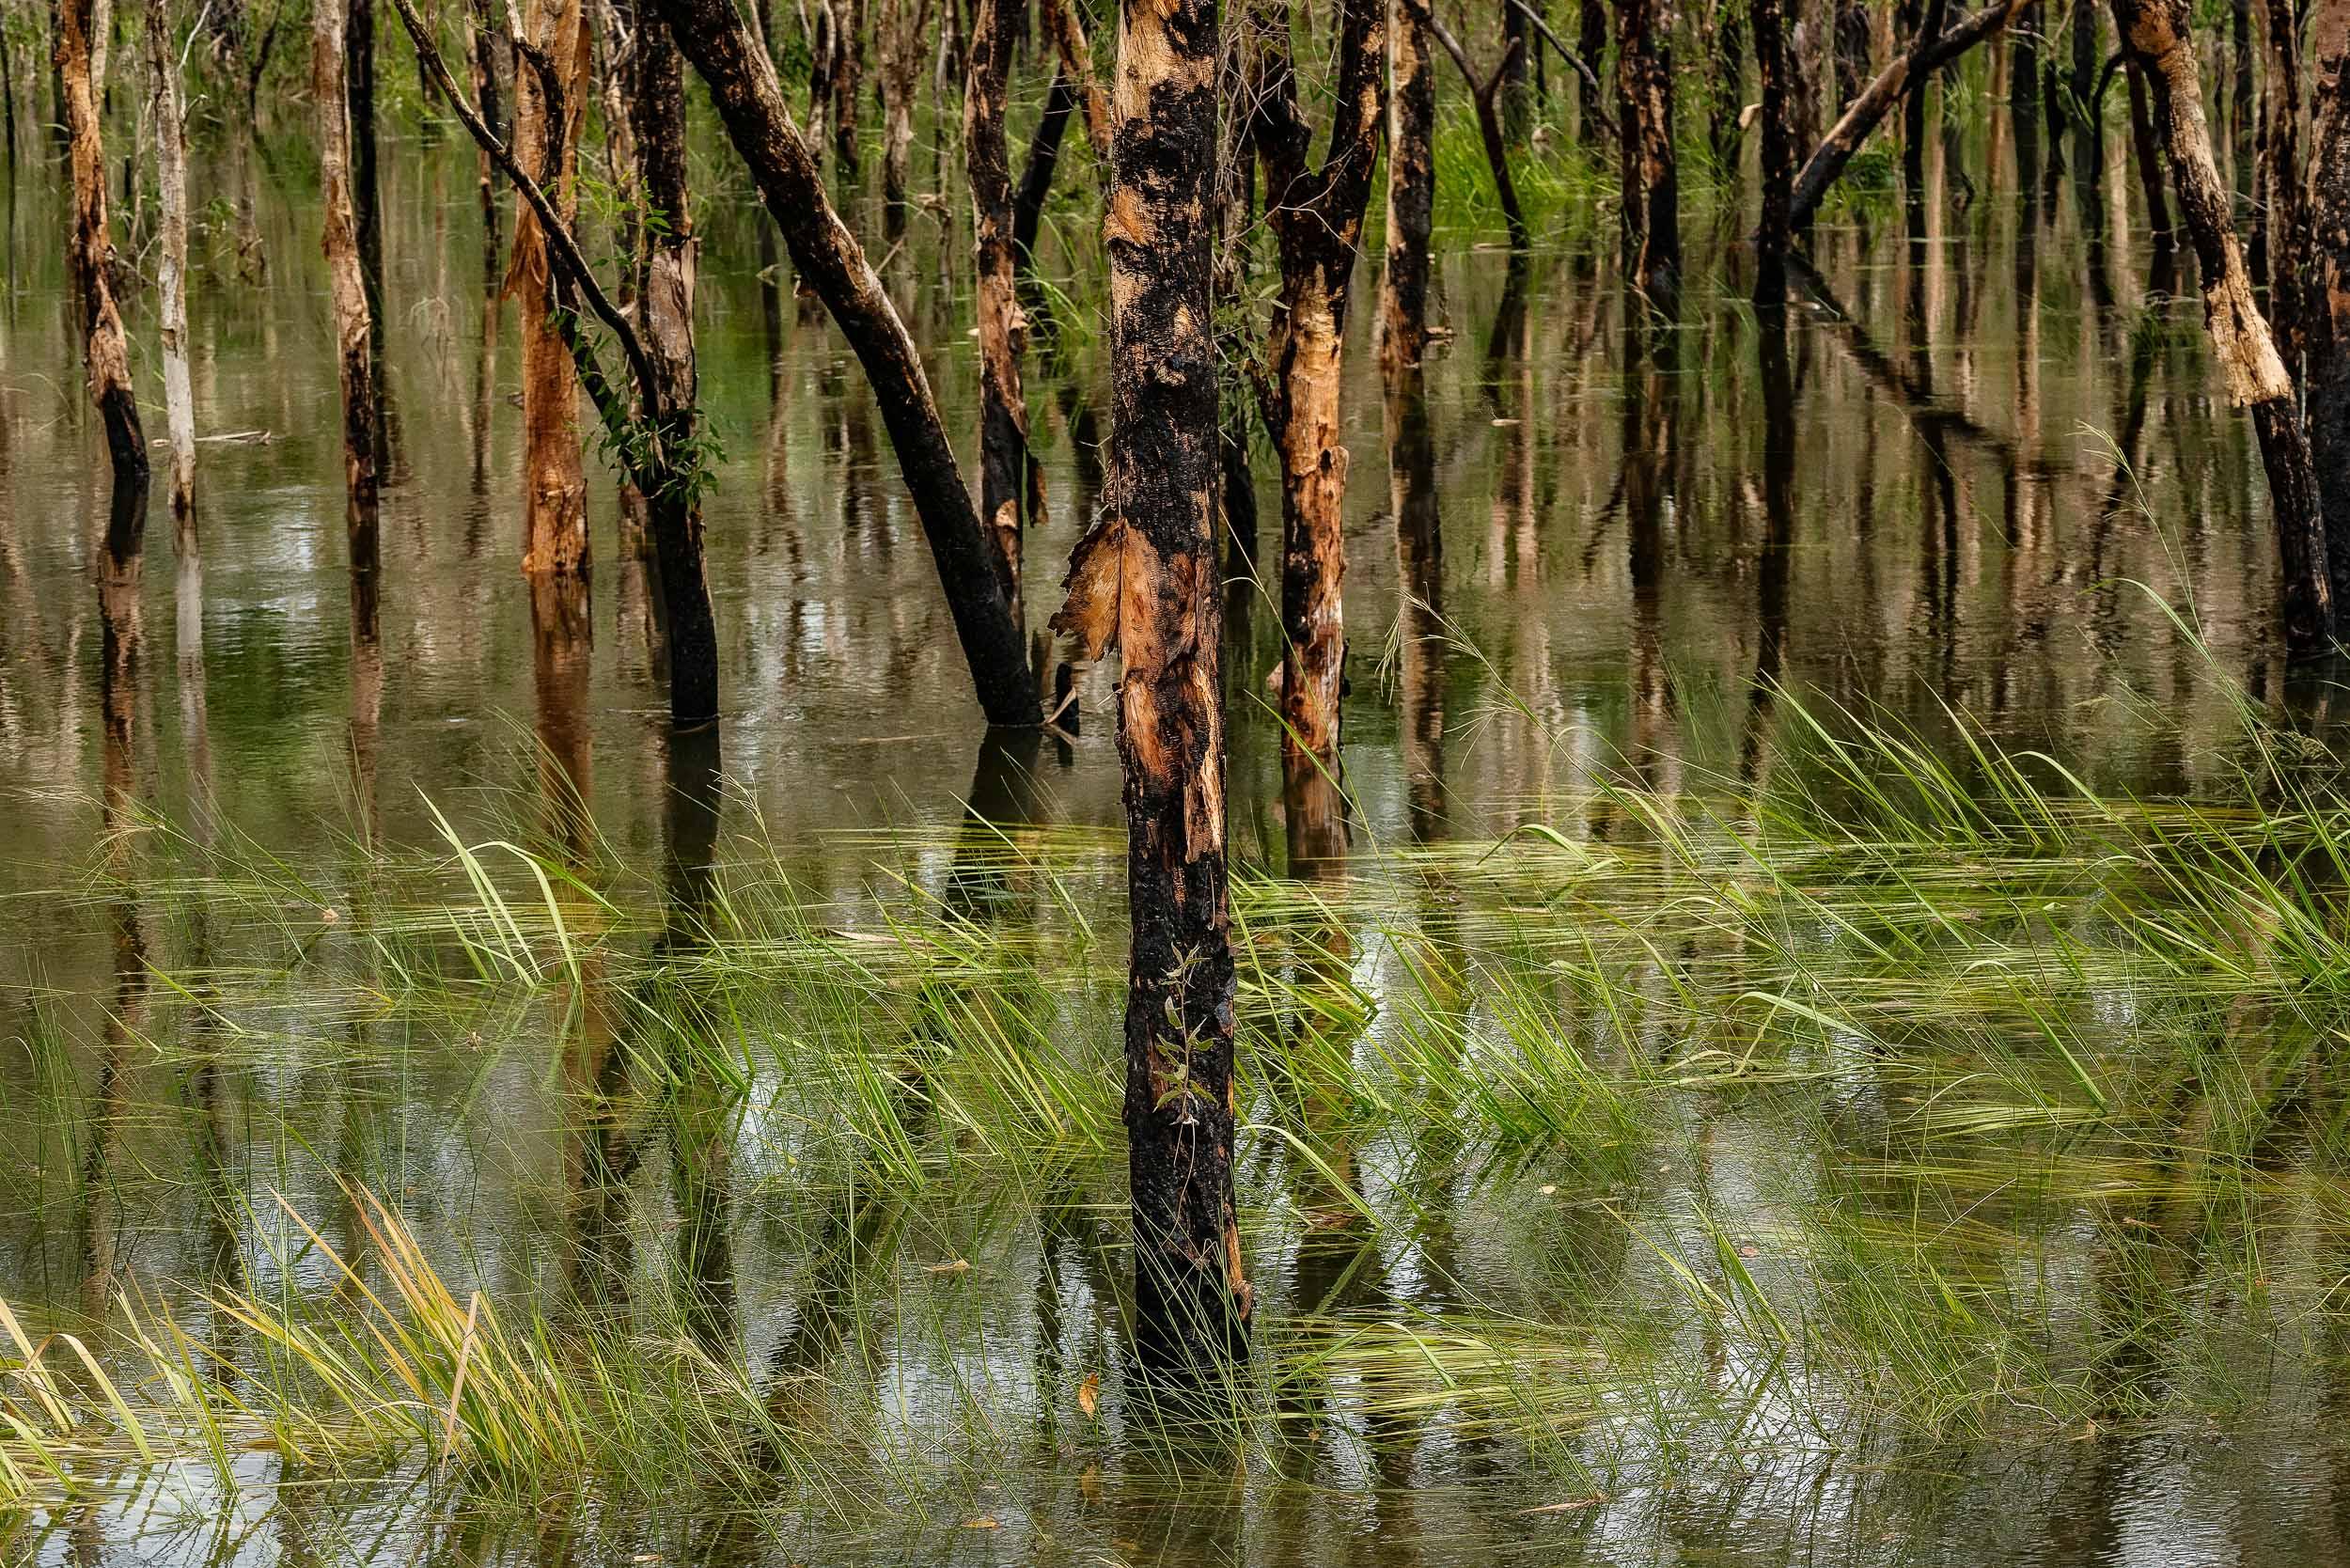 Flooded landscape  on the  Kakadu Highway  between Jabiru and Cooinda in the  Kakadu National Park, Australia .